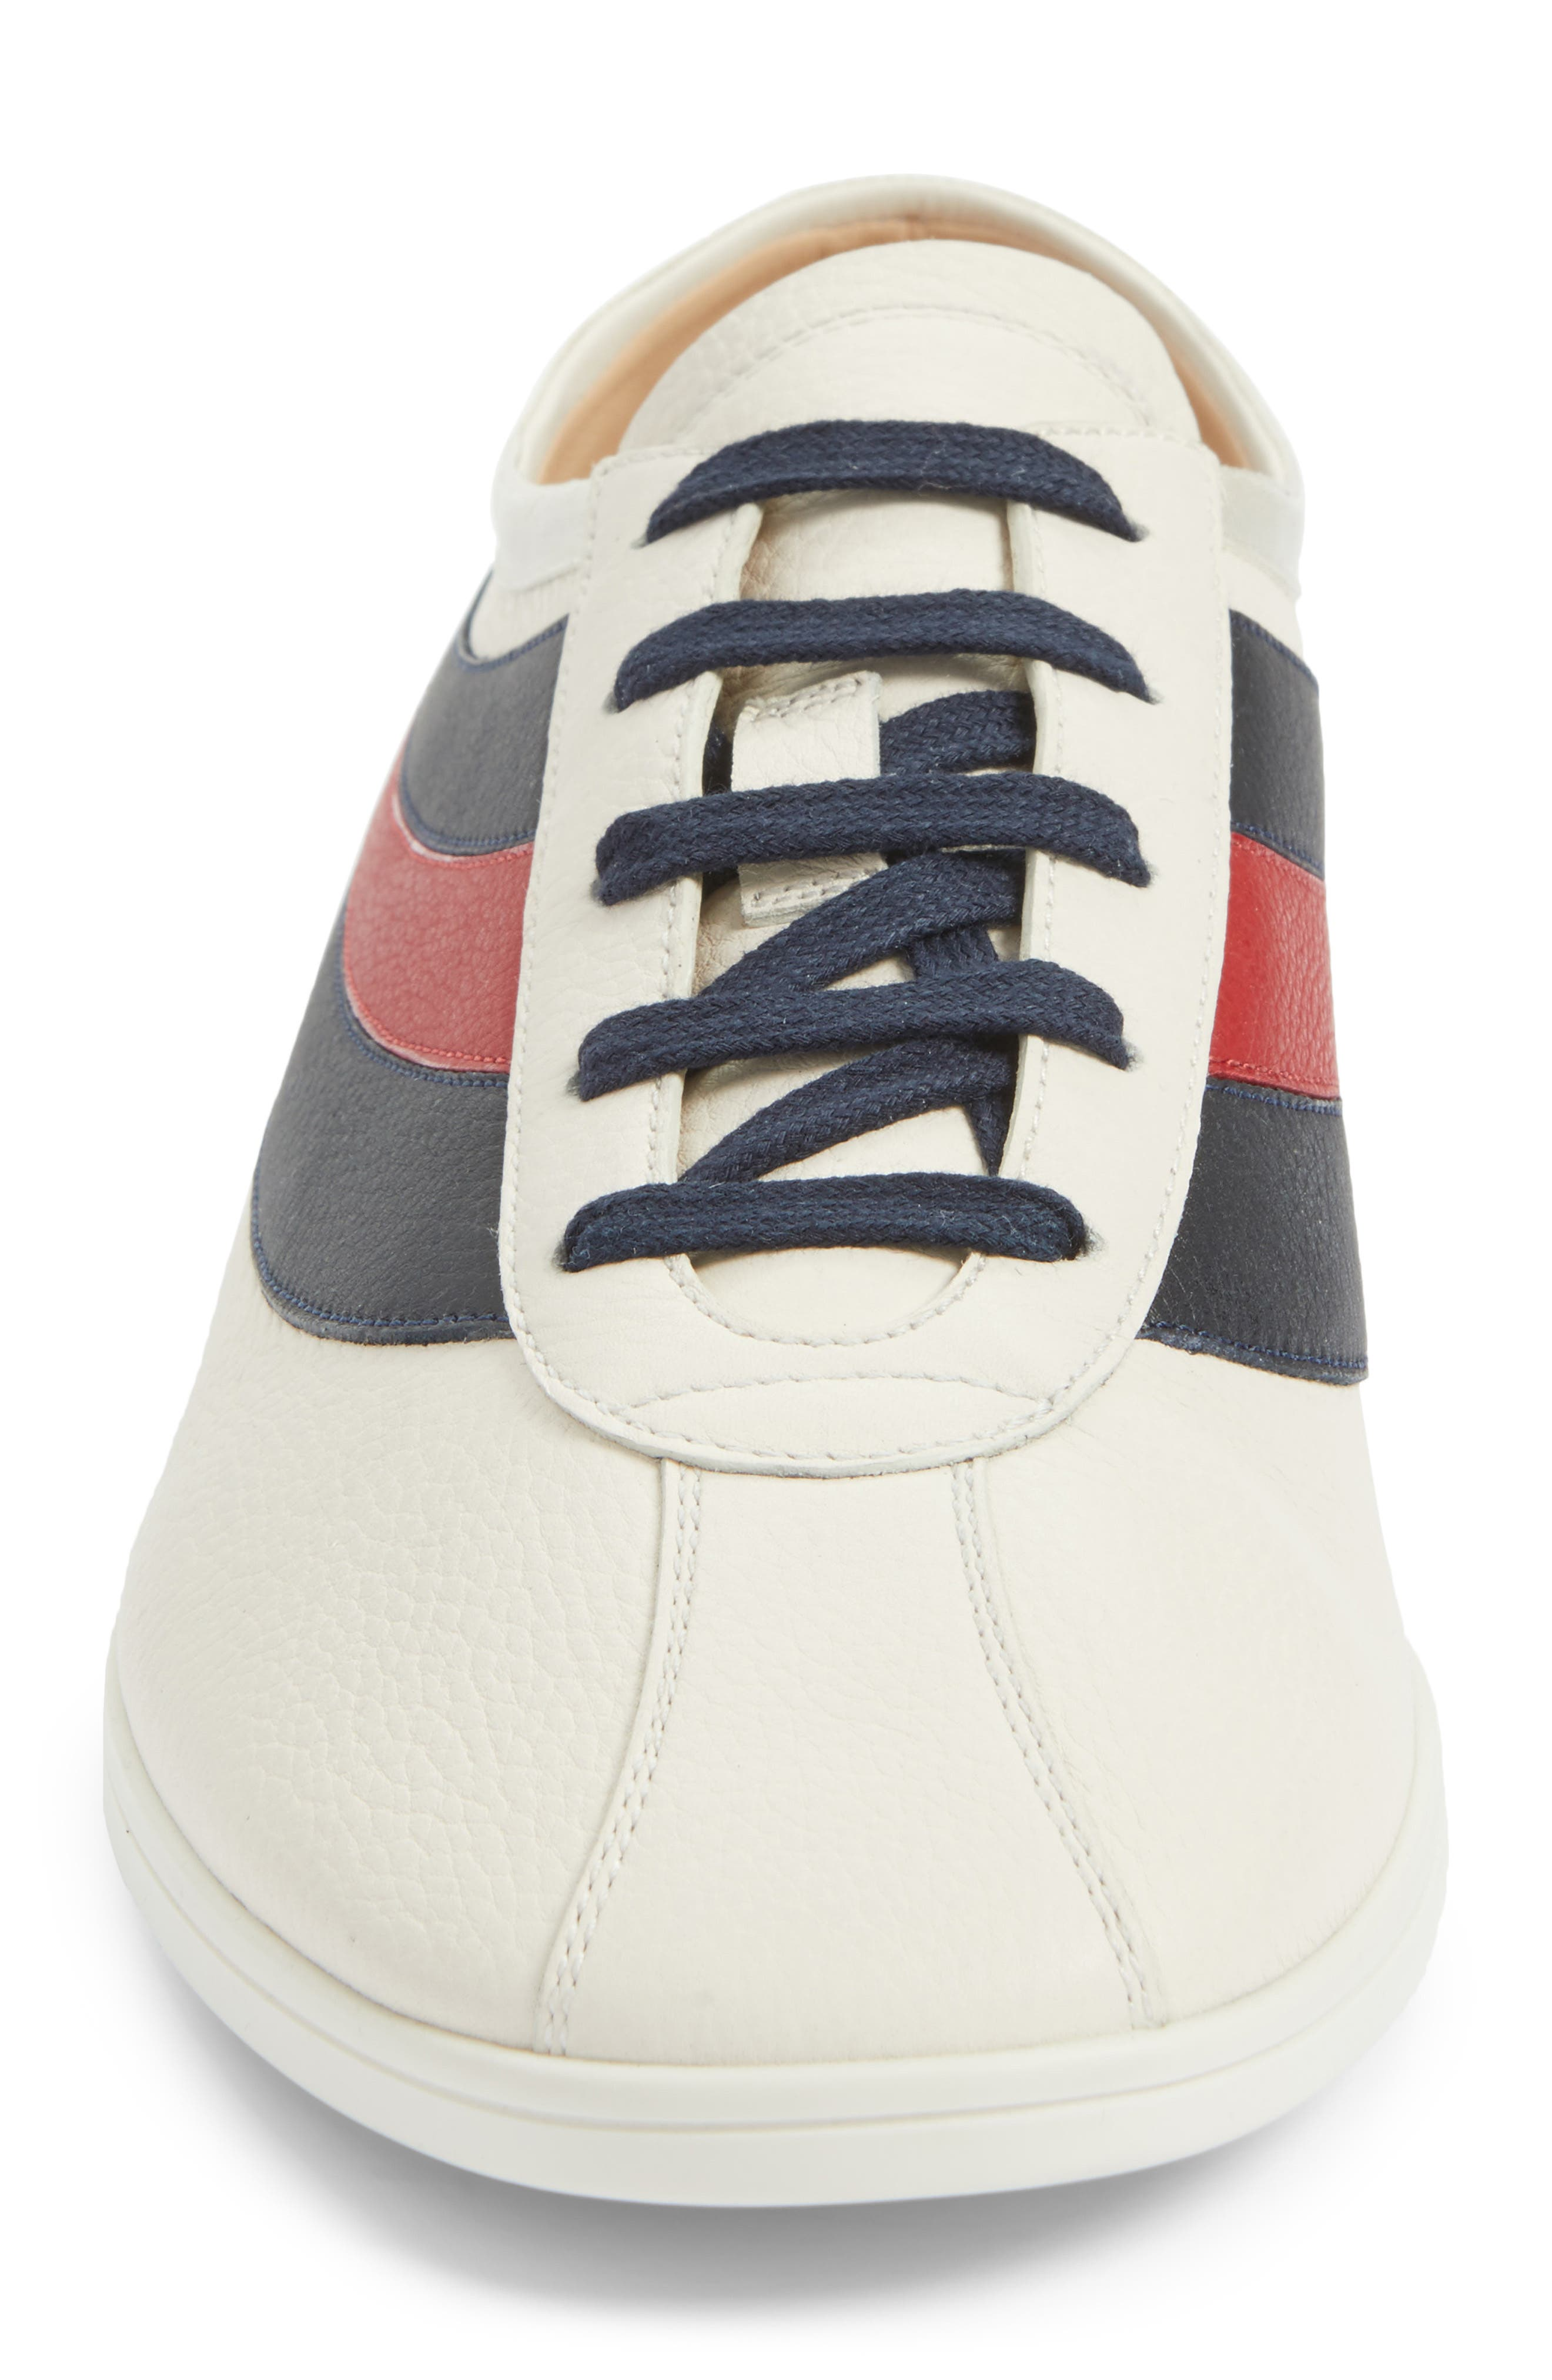 Falacer Sneaker,                             Alternate thumbnail 4, color,                             106